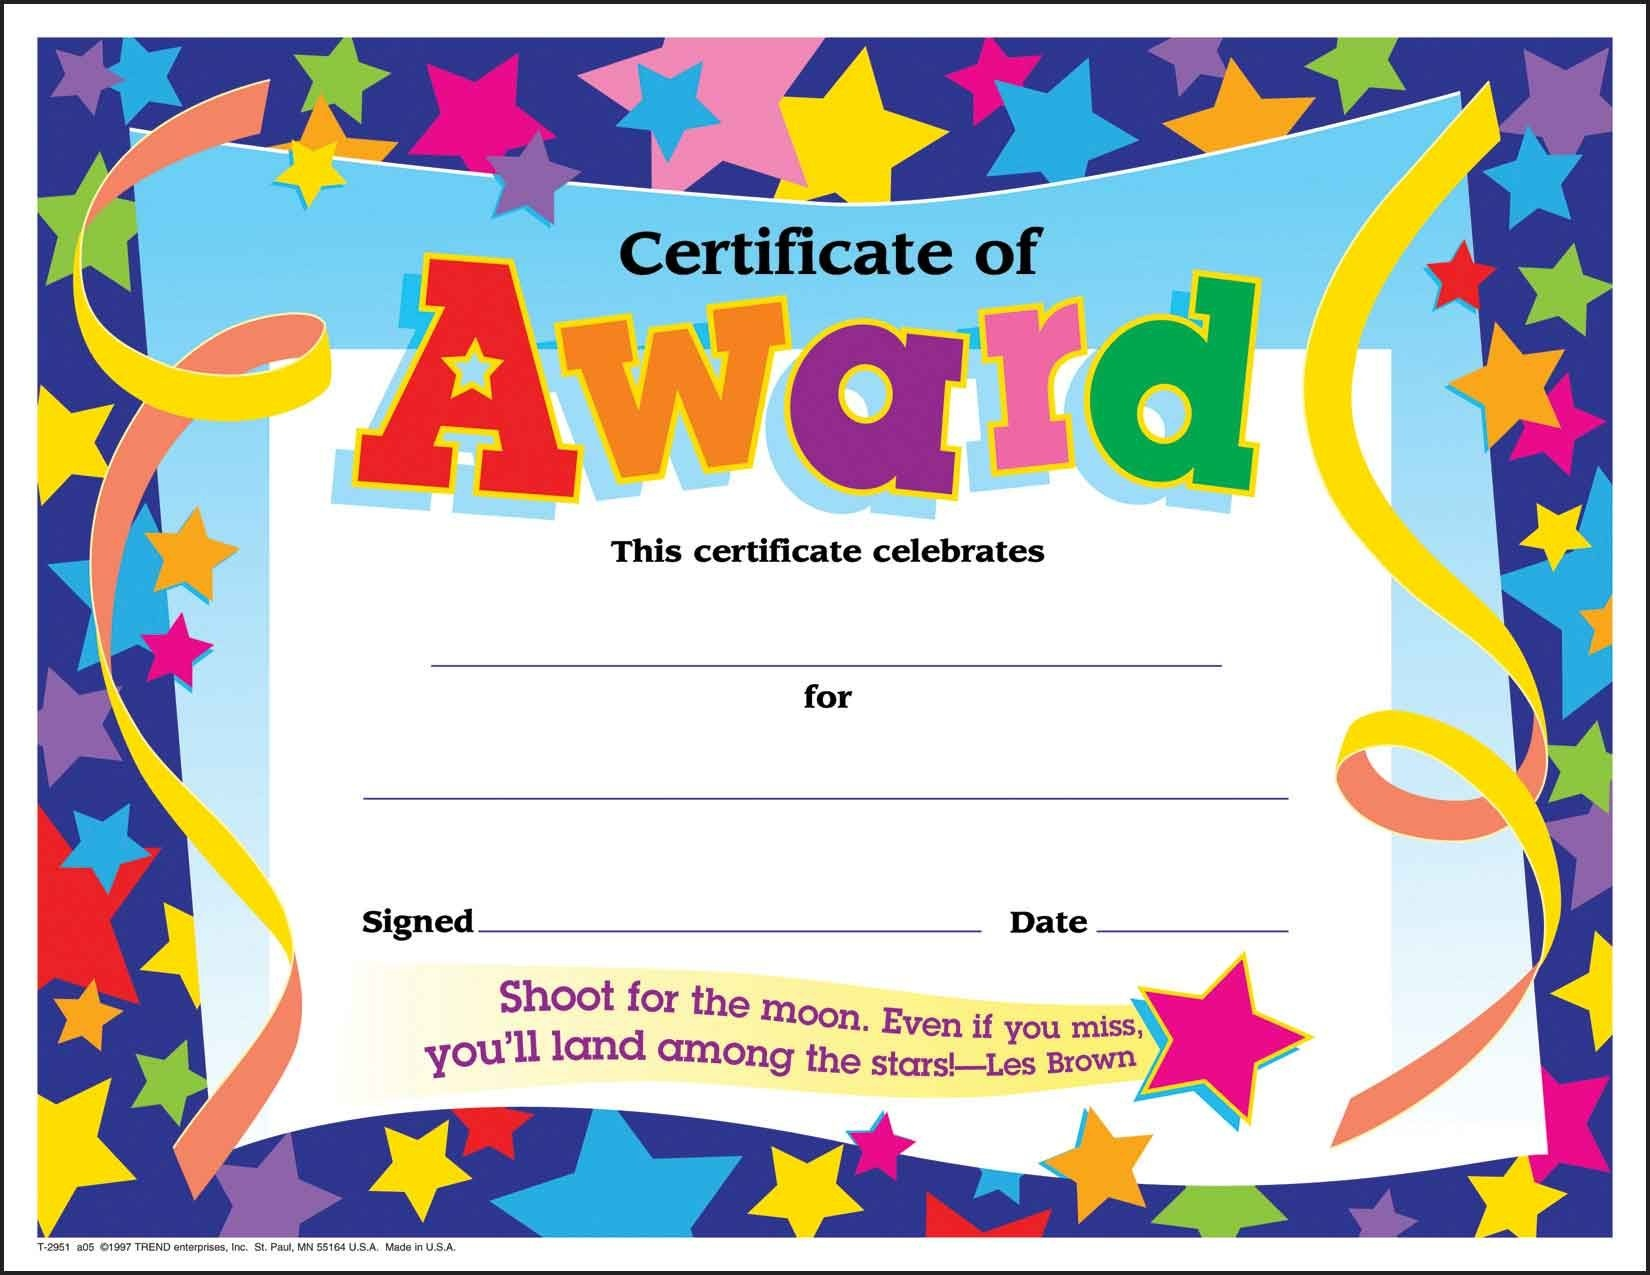 Certificate Template For Kids Free Certificate Templates - Free Printable Honor Roll Certificates Kids